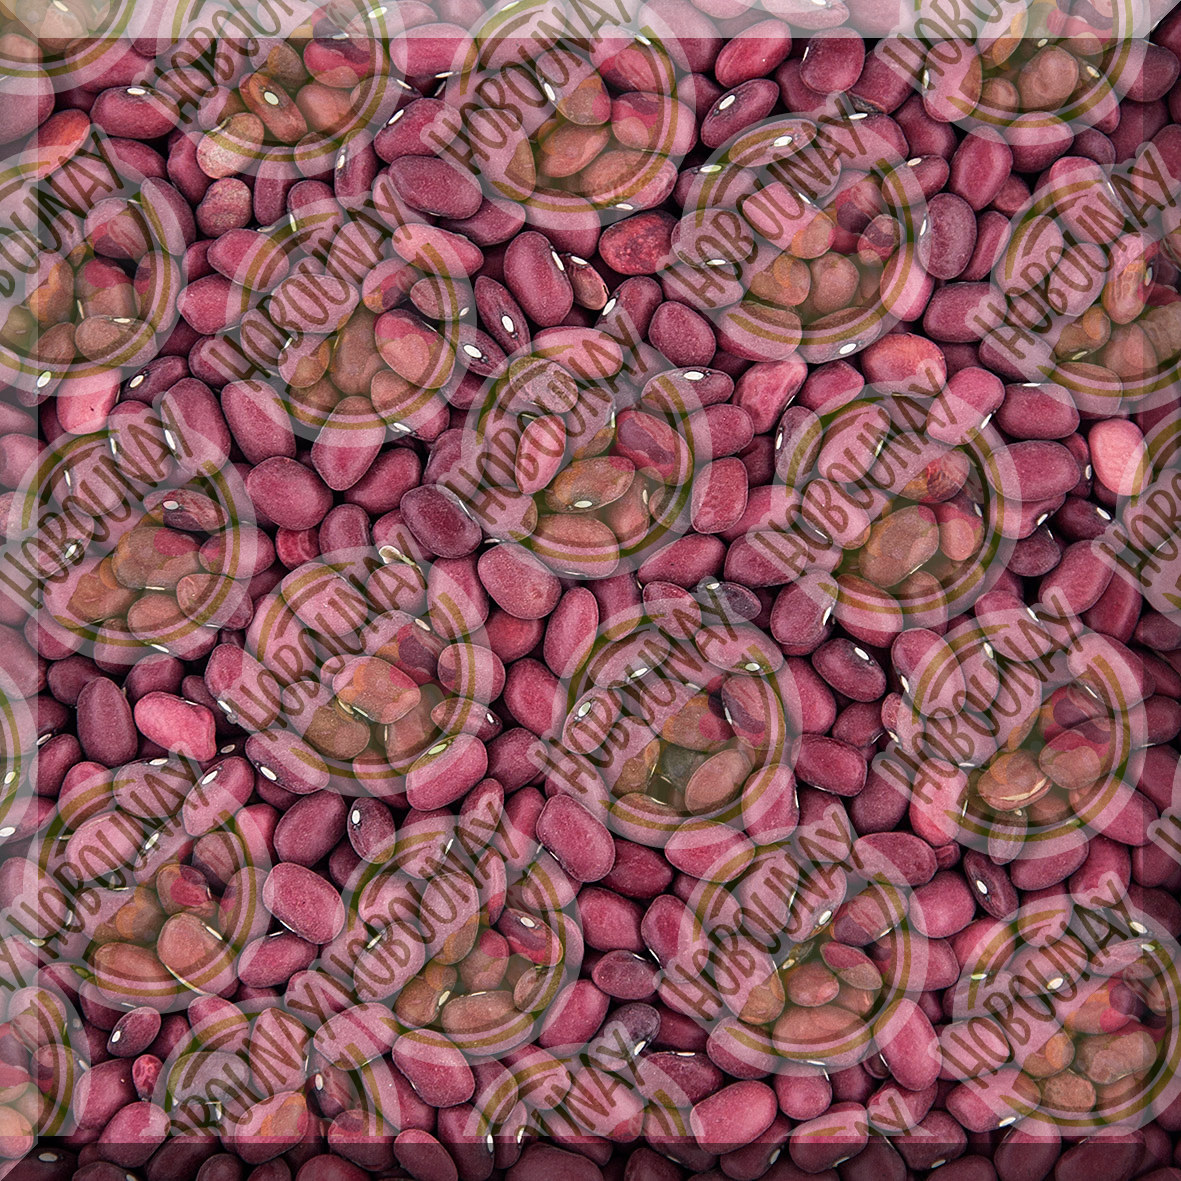 فروش لوبیا قرمز شیراز